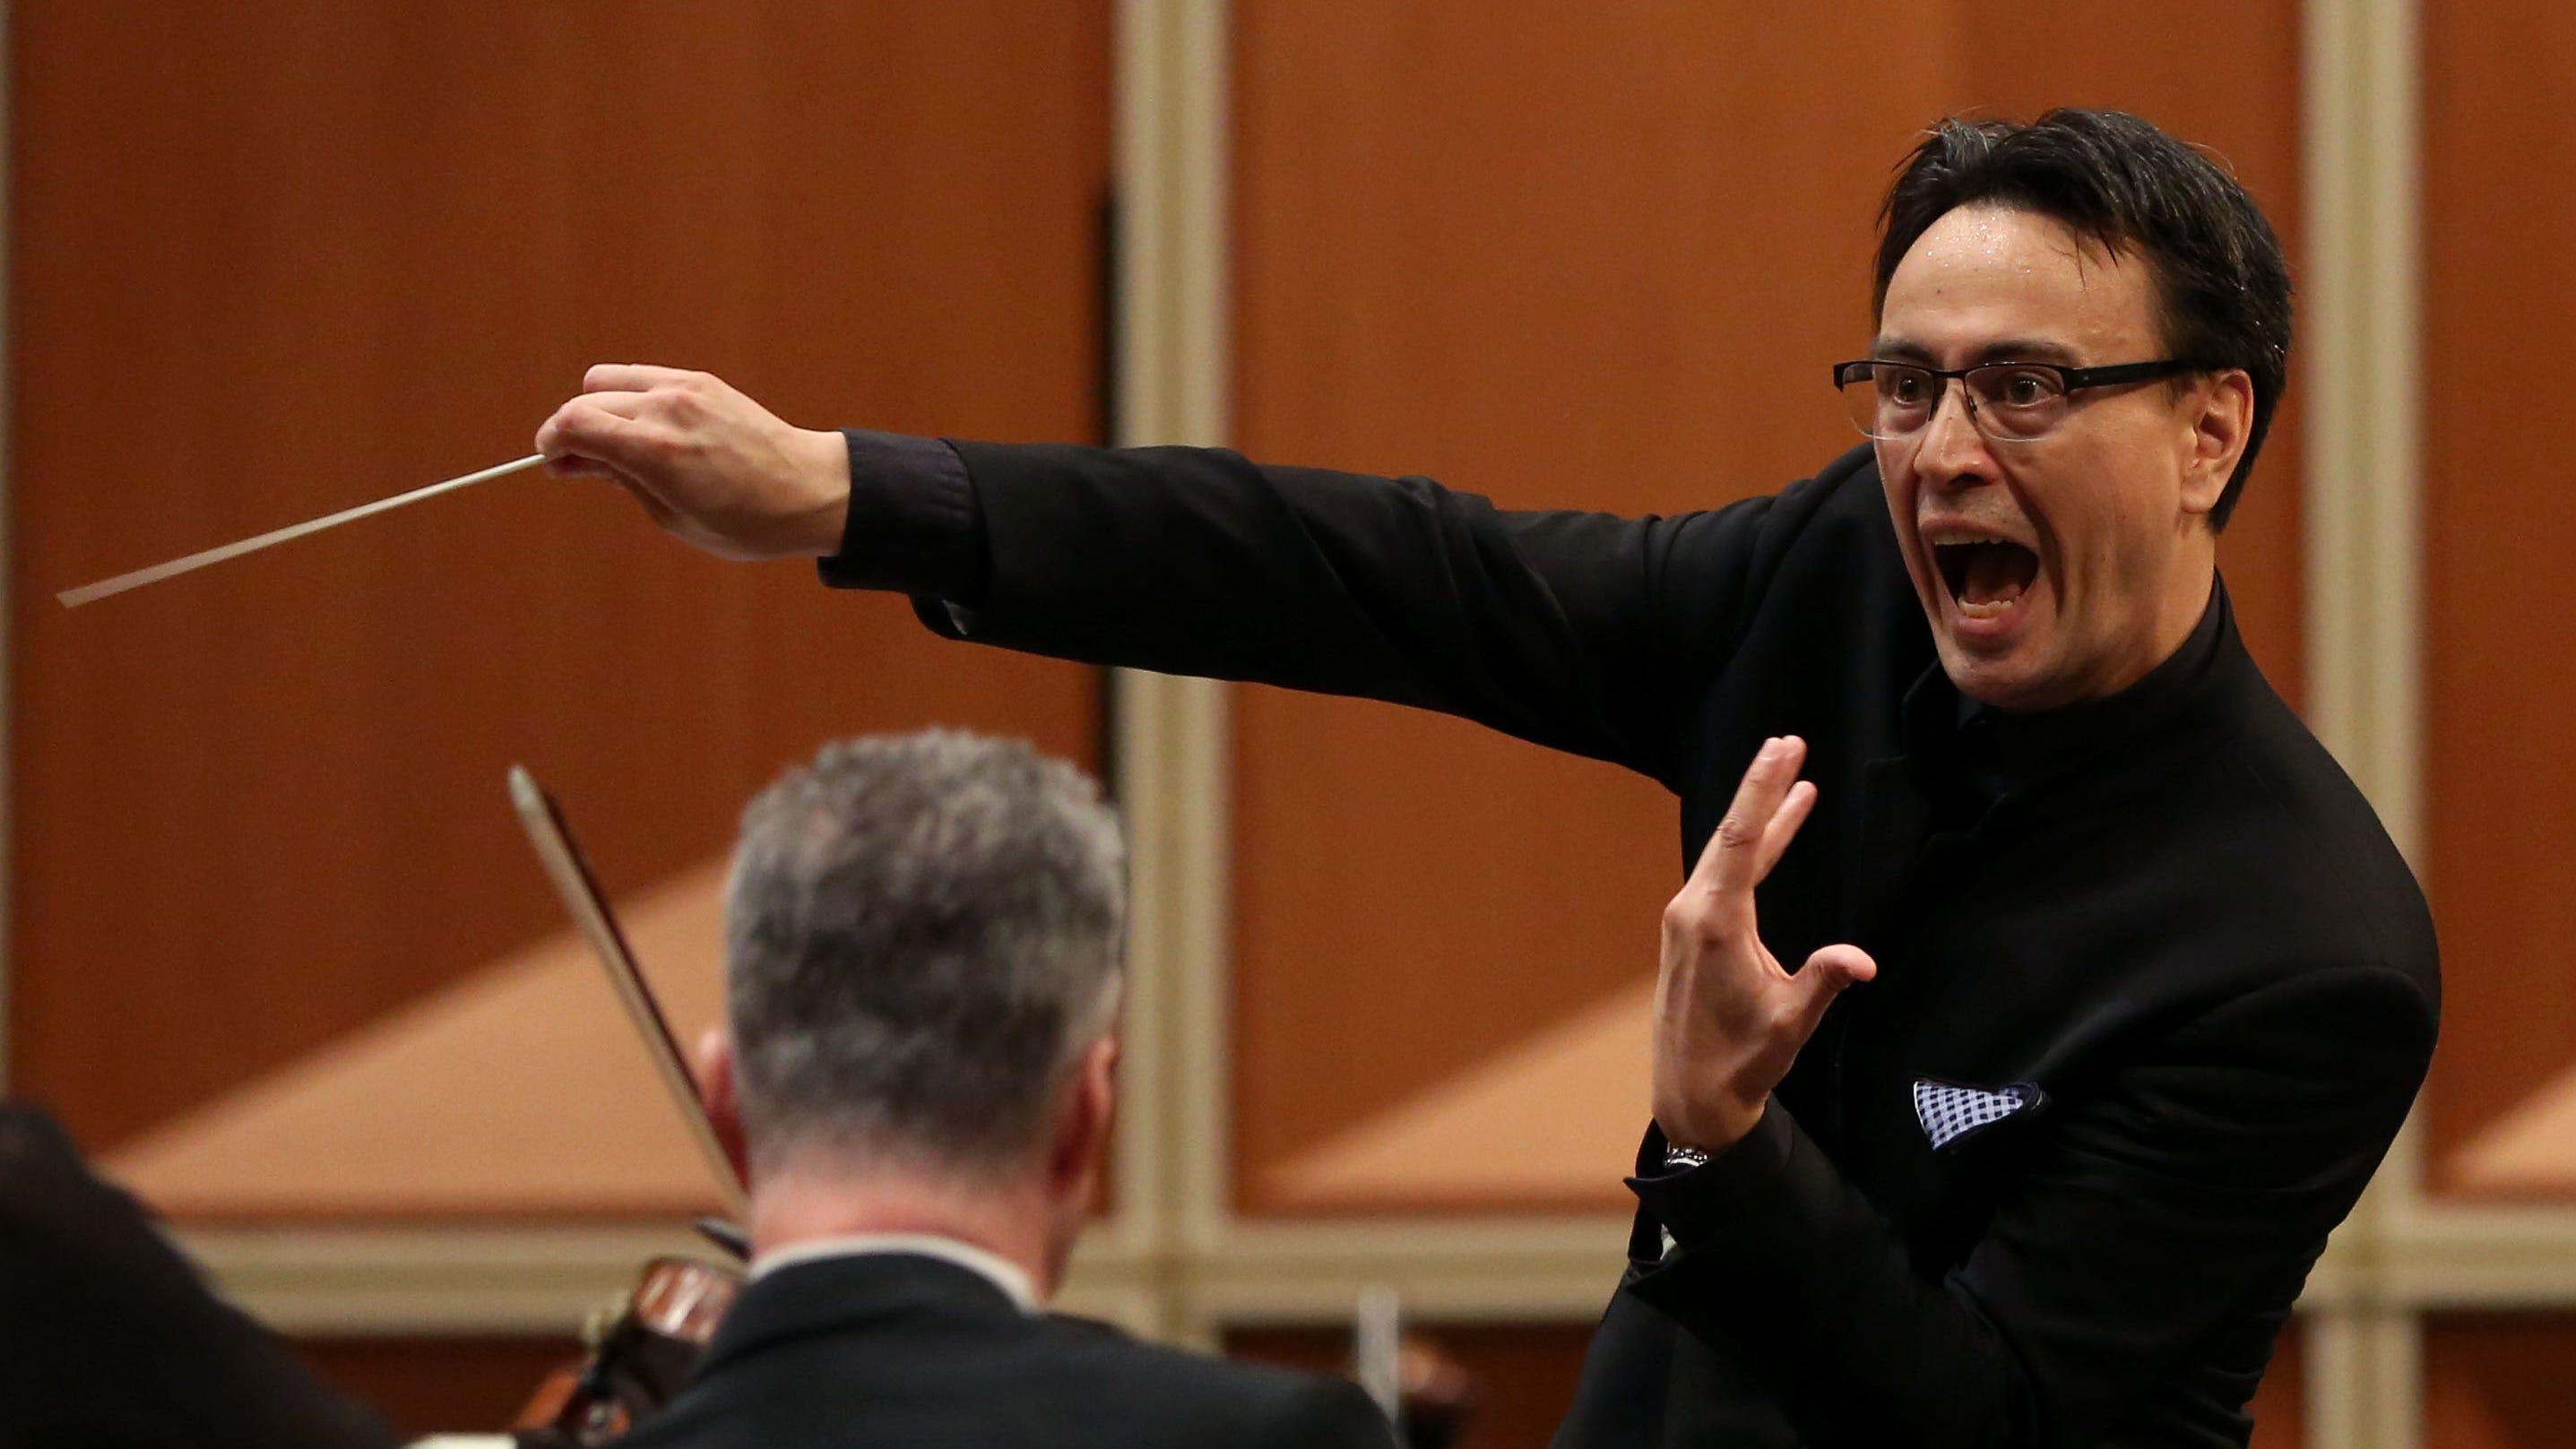 Guest conductor Ken-David Masur leads the...